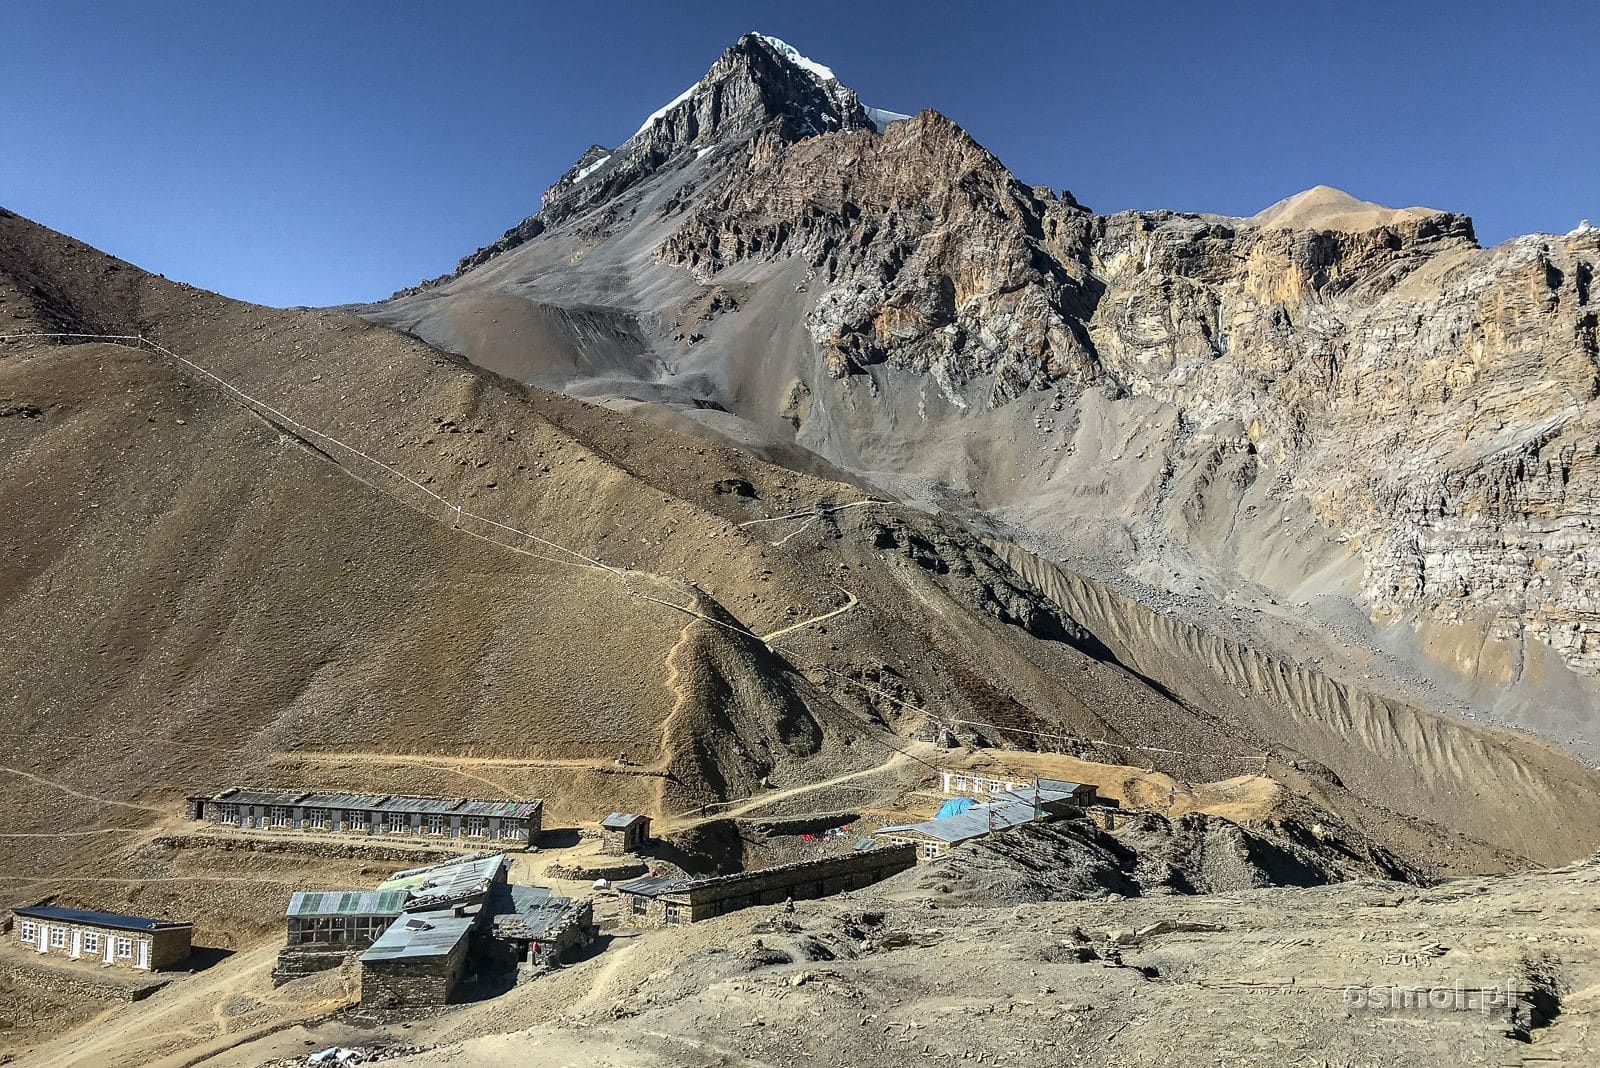 Widok na High Camp na szlaku dookoła Annapurny